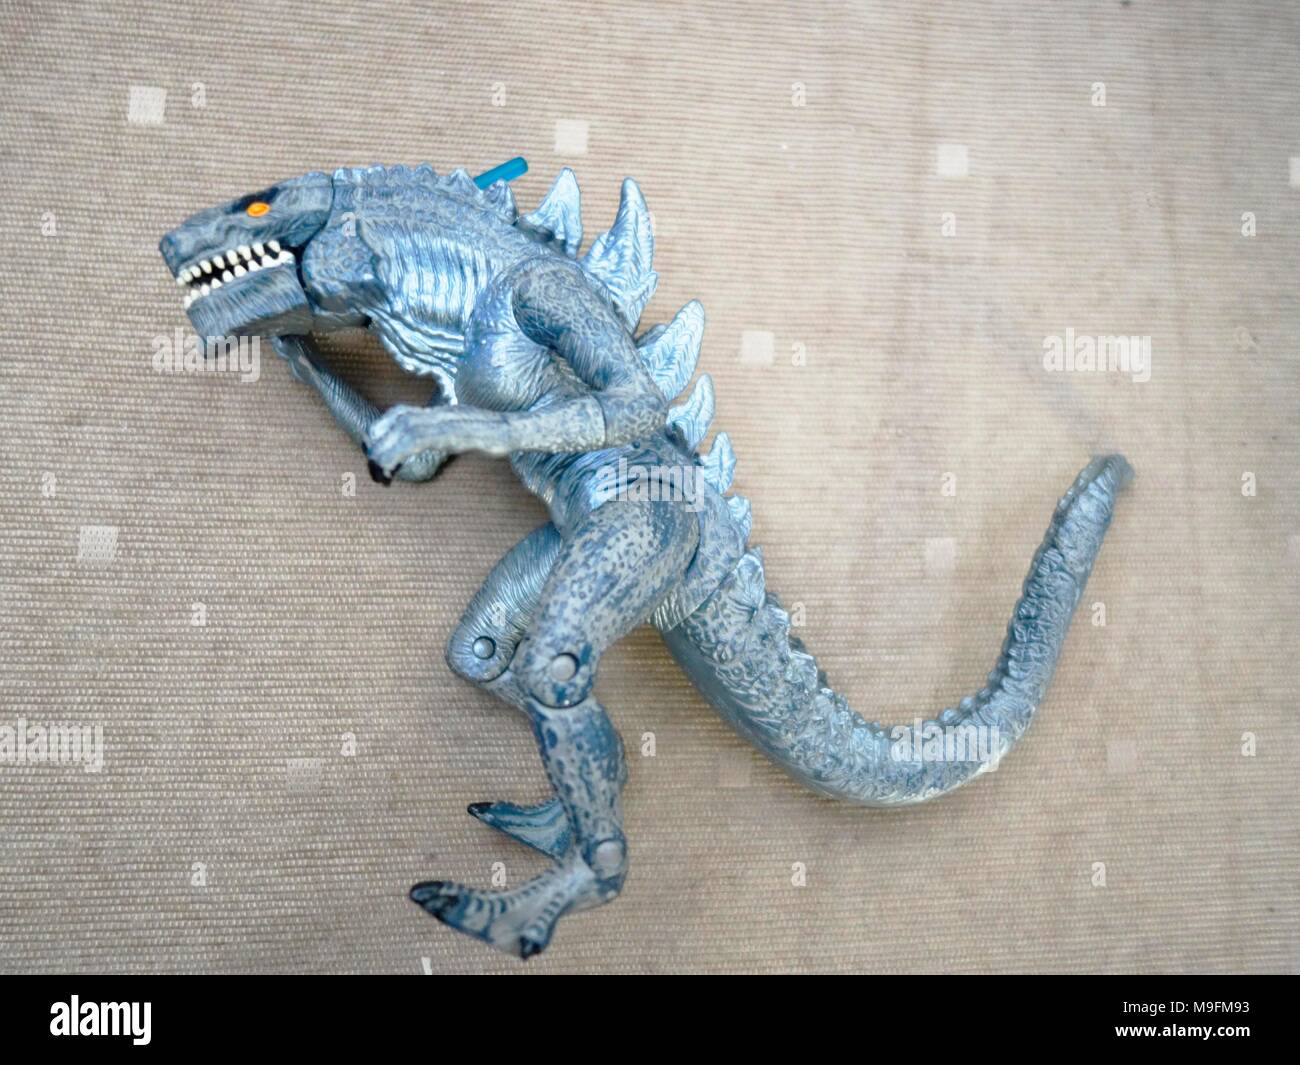 90s trendmasters Godzilla figure - Stock Image